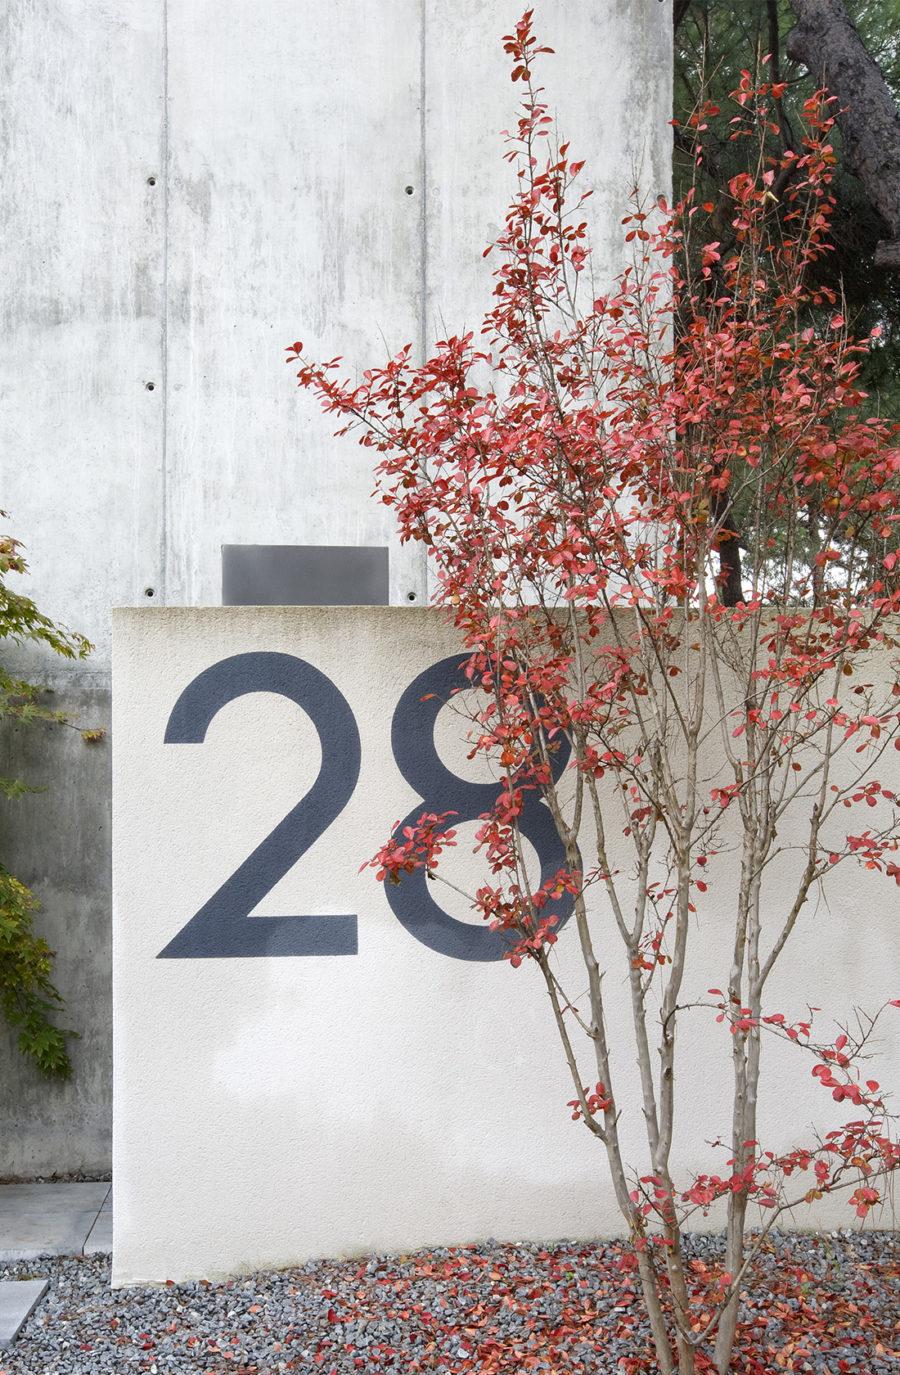 Detalle de la fachada de hormigón, acceso a sede ÁBATON Arquitectura